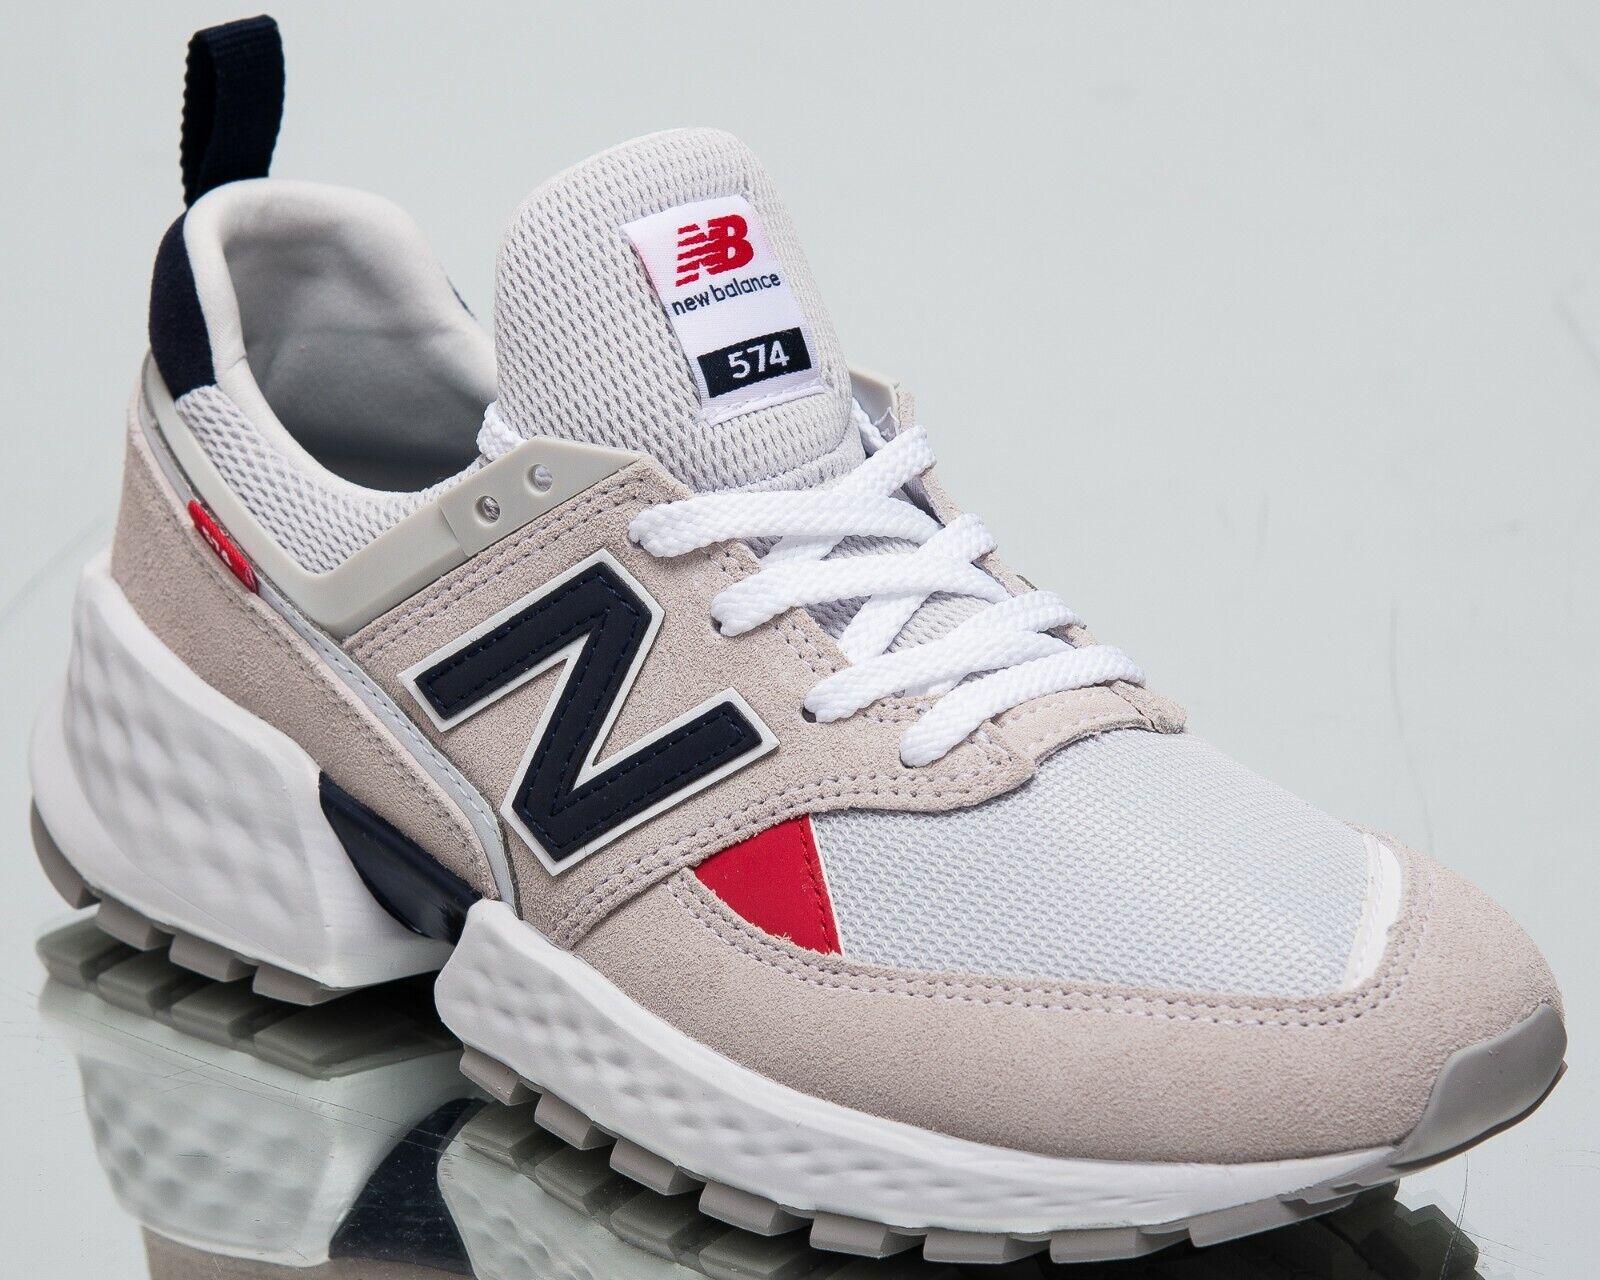 New balance 574 Sport cremosa activamente Lifestyle zapatillas ms574-gnc